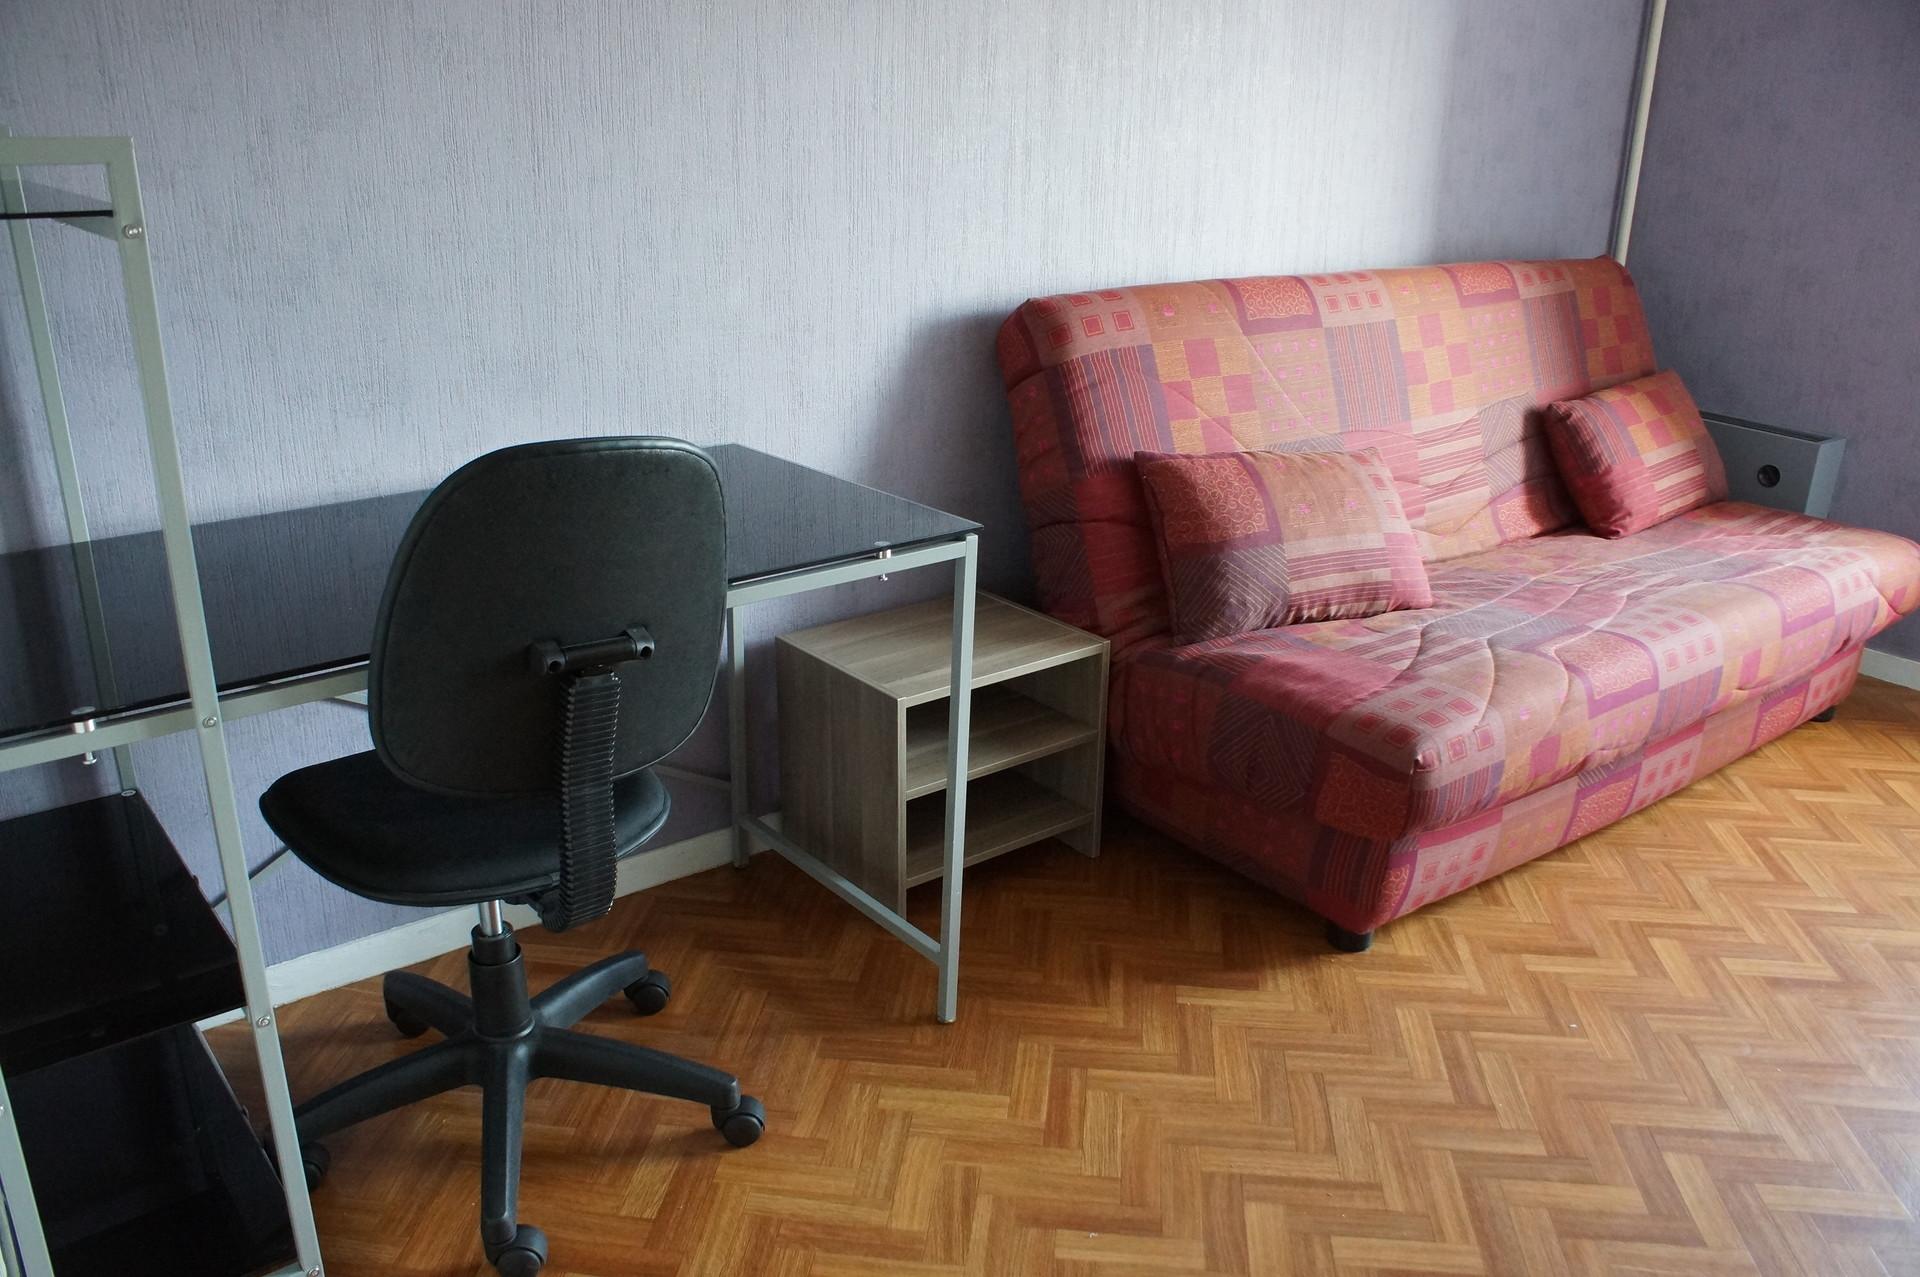 chambre-meublee-t4-4-colocataires-rennes-villejean-151f3e03aa6f9c0725343a158c48487c